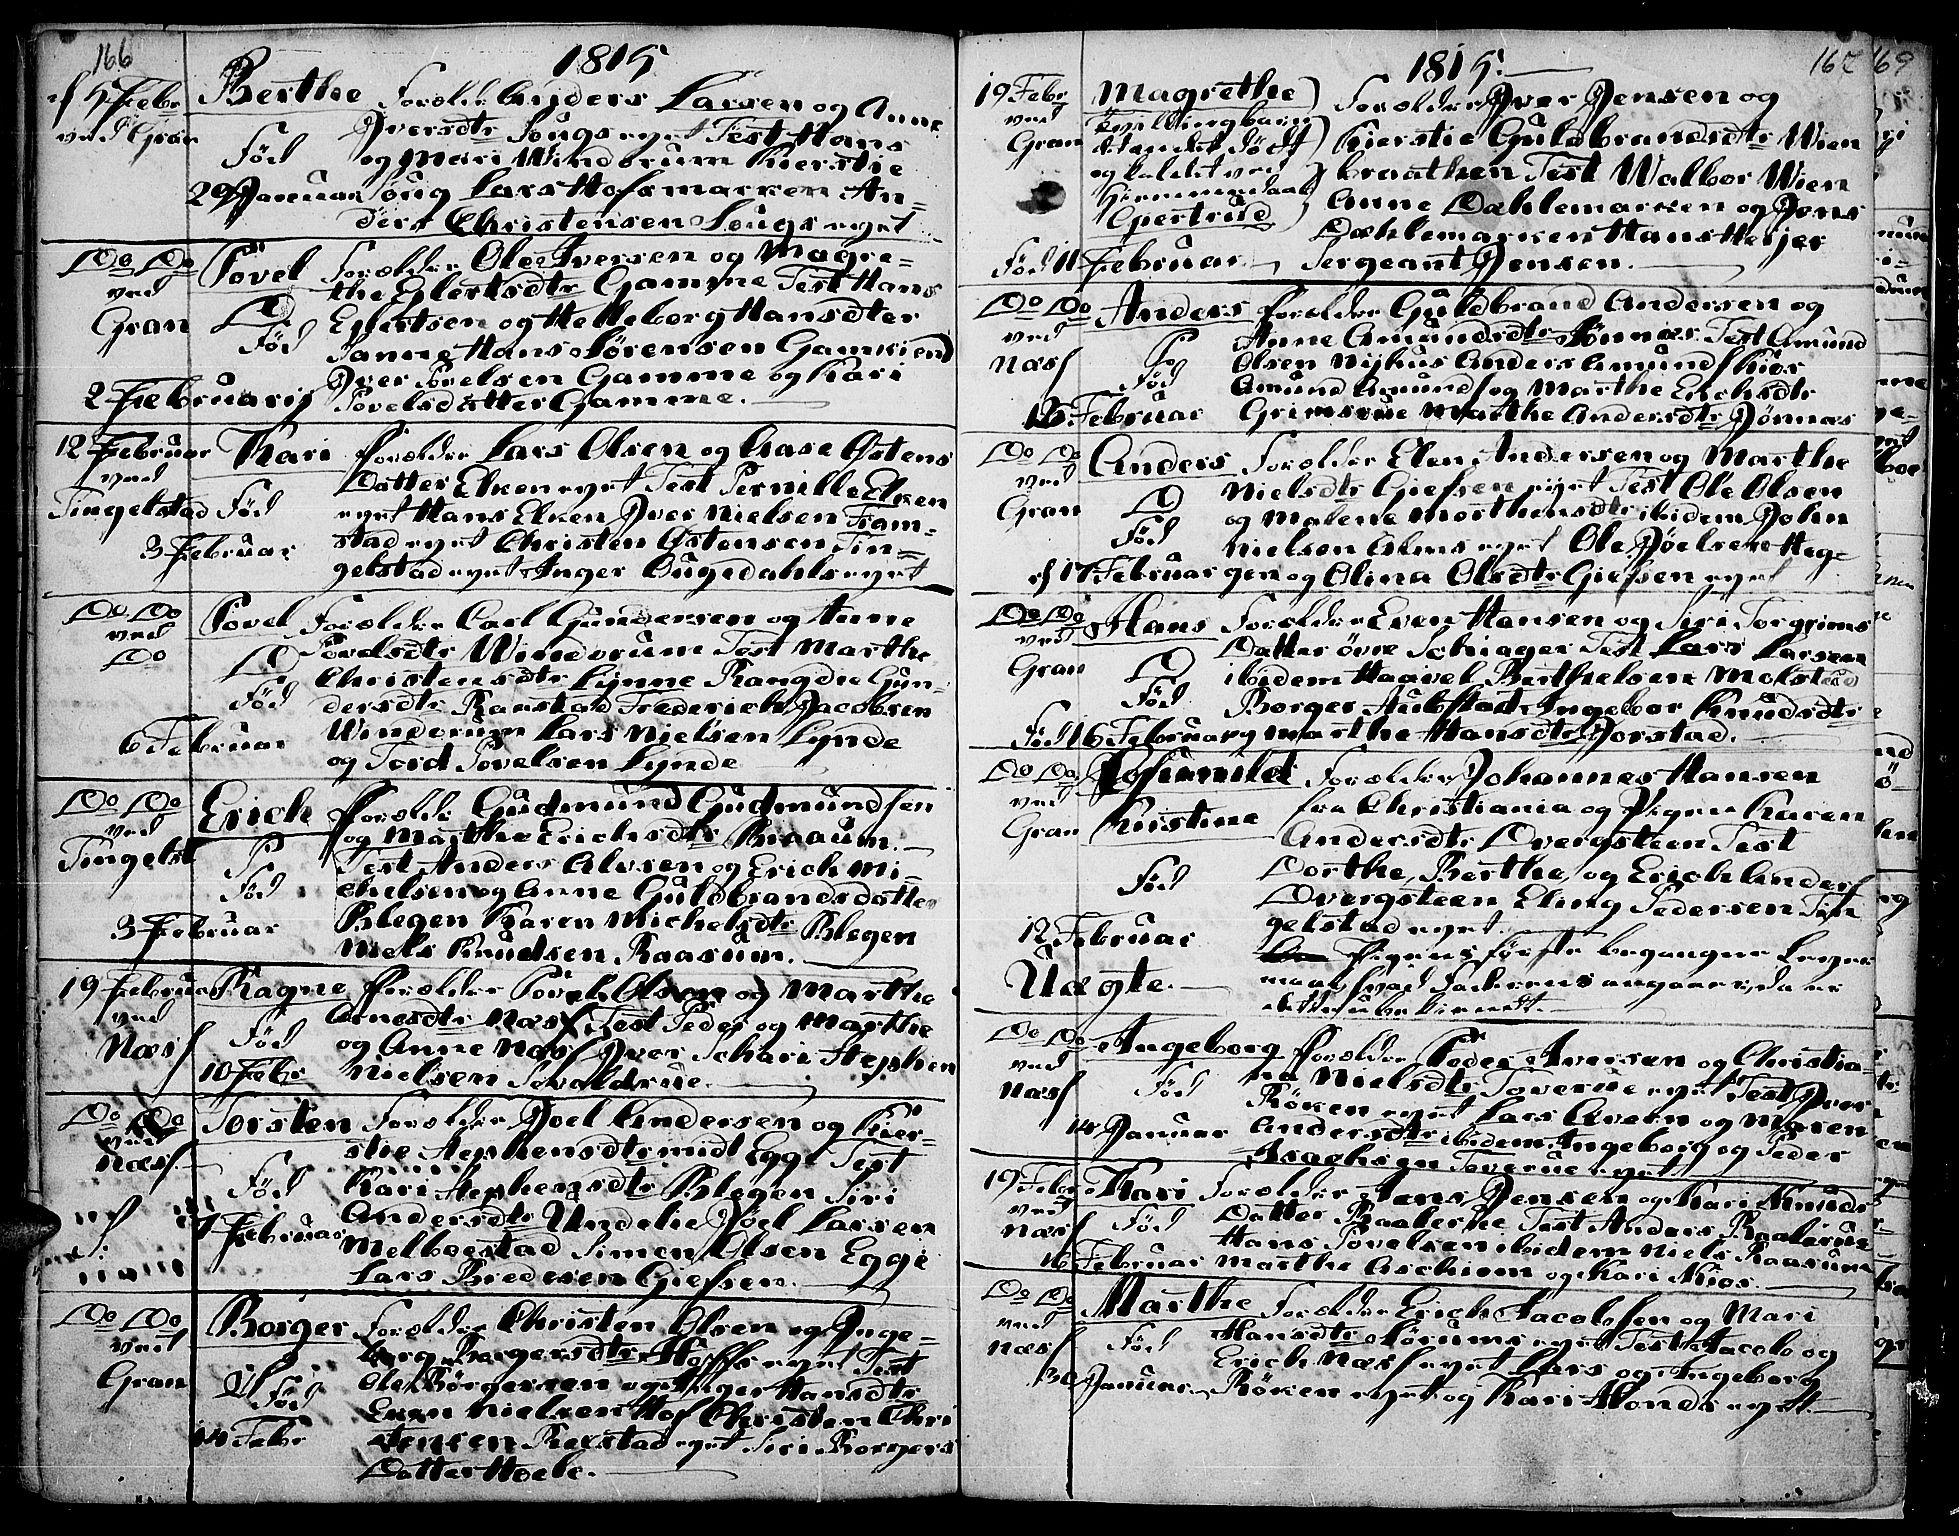 SAH, Gran prestekontor, Ministerialbok nr. 7, 1804-1815, s. 166-167